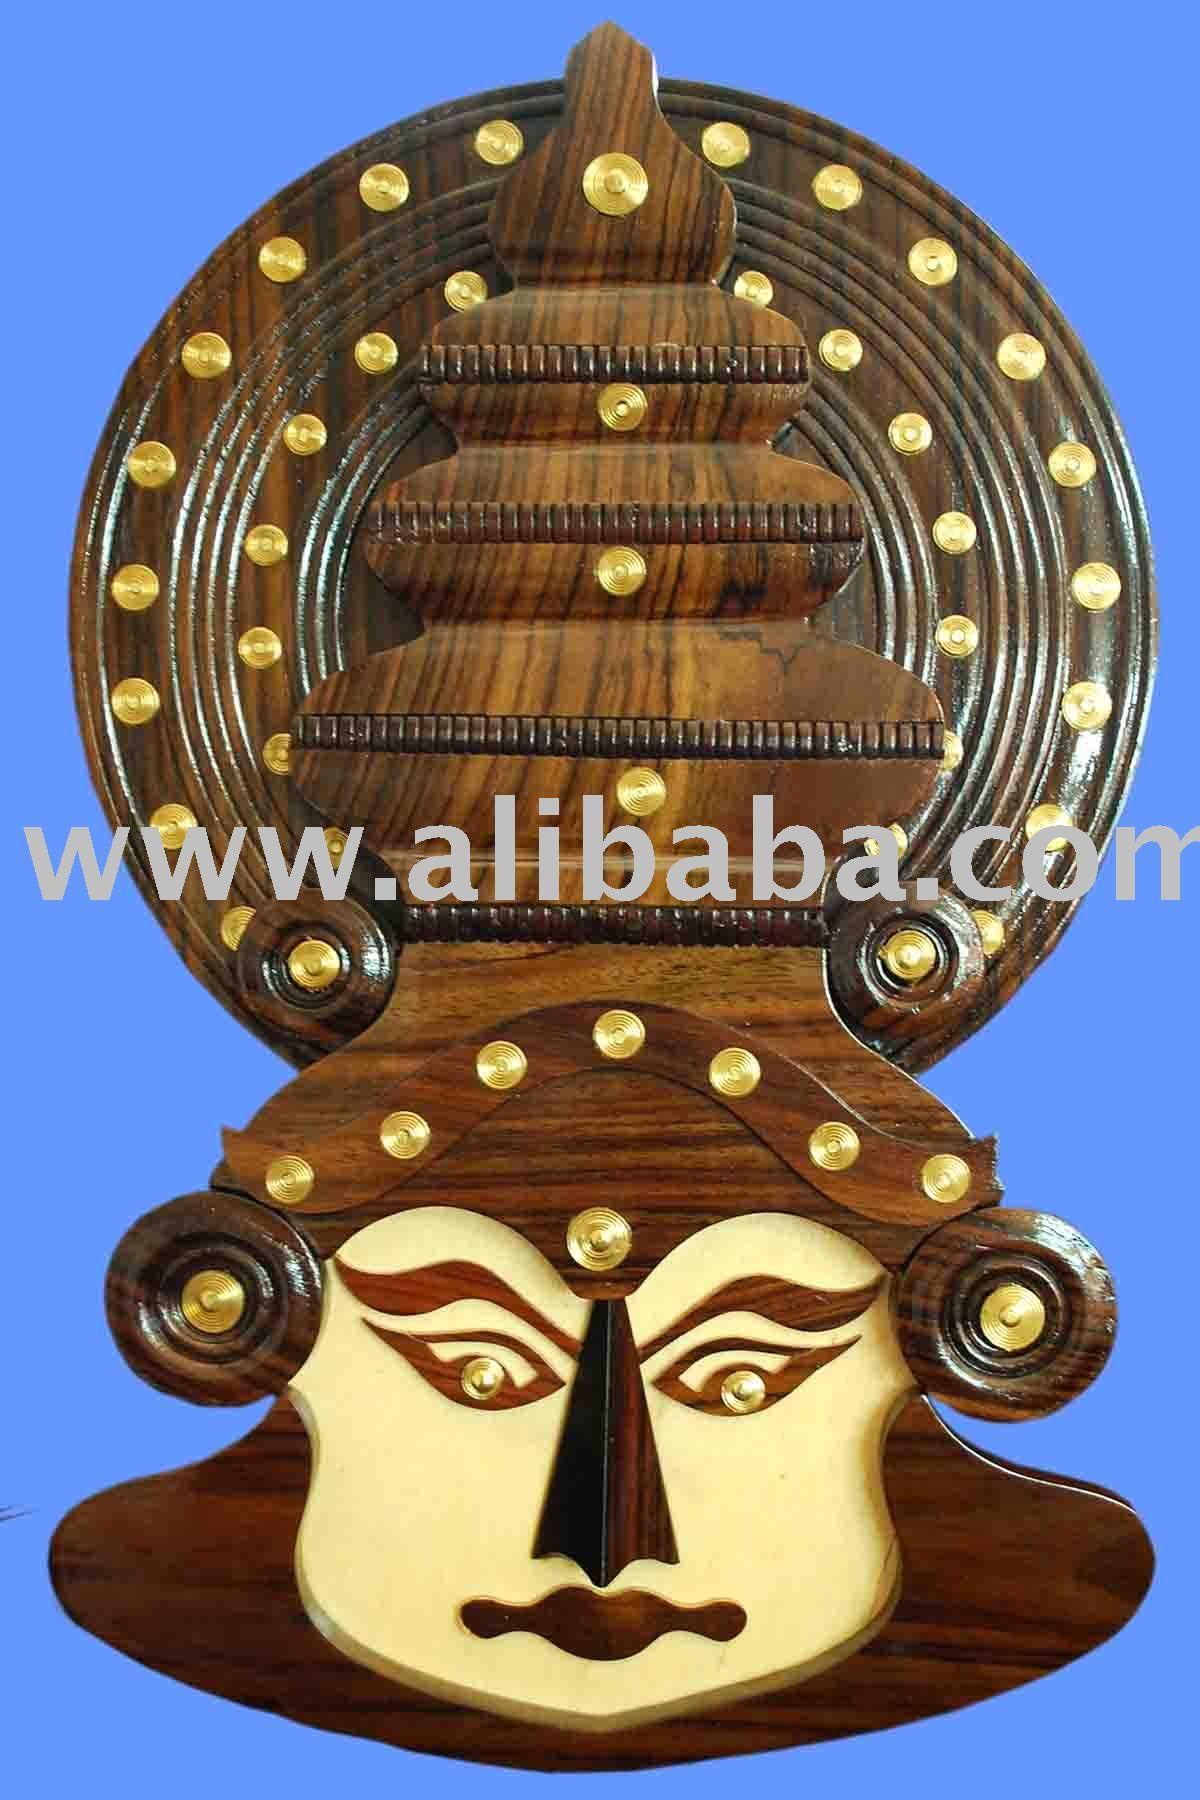 Kerala Handicrafts Google Search Kerala Kerala Google Search